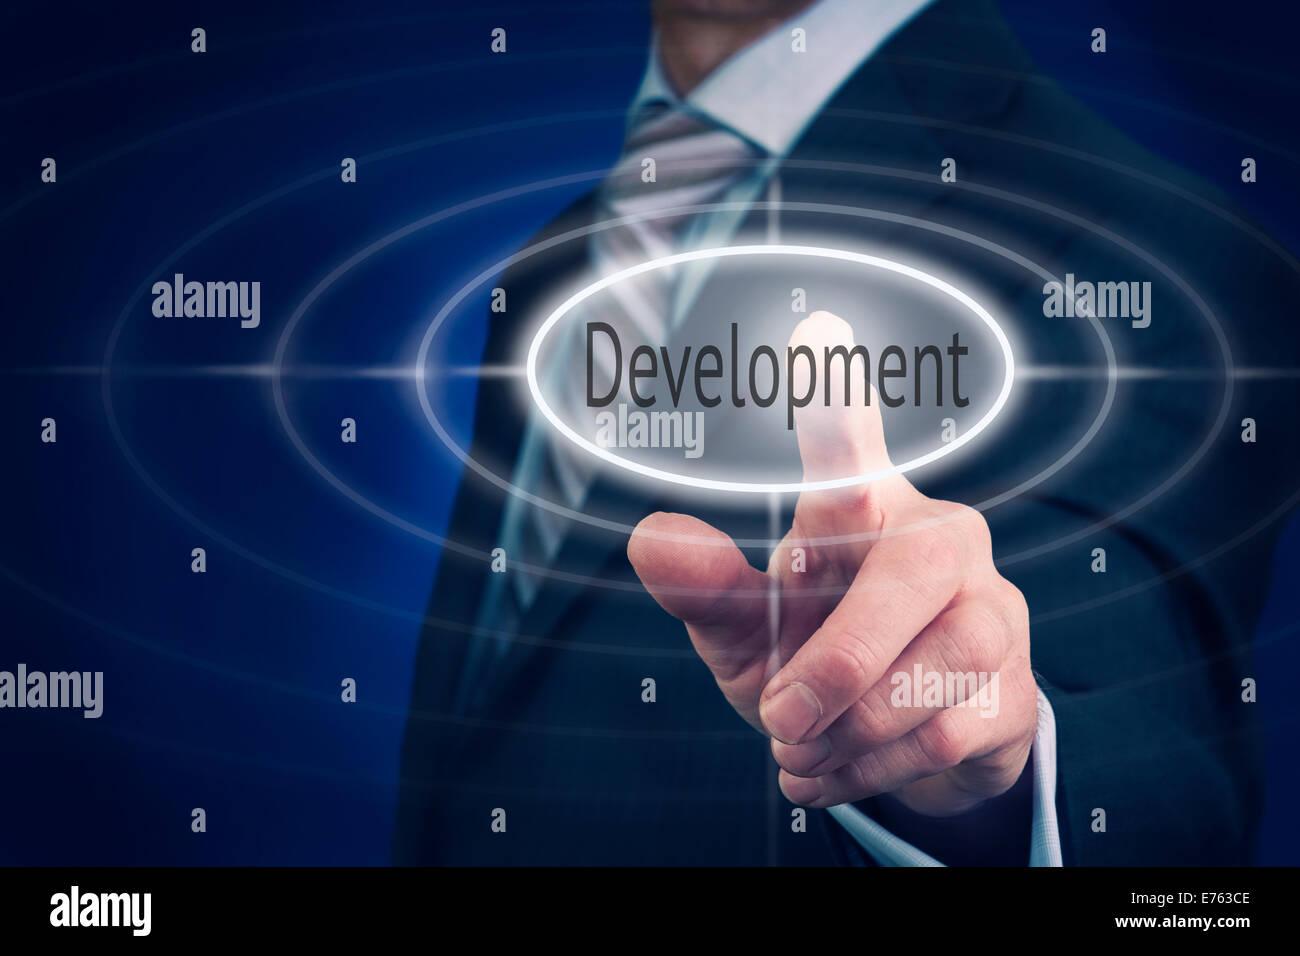 Businessman pressing a Development concept button. - Stock Image